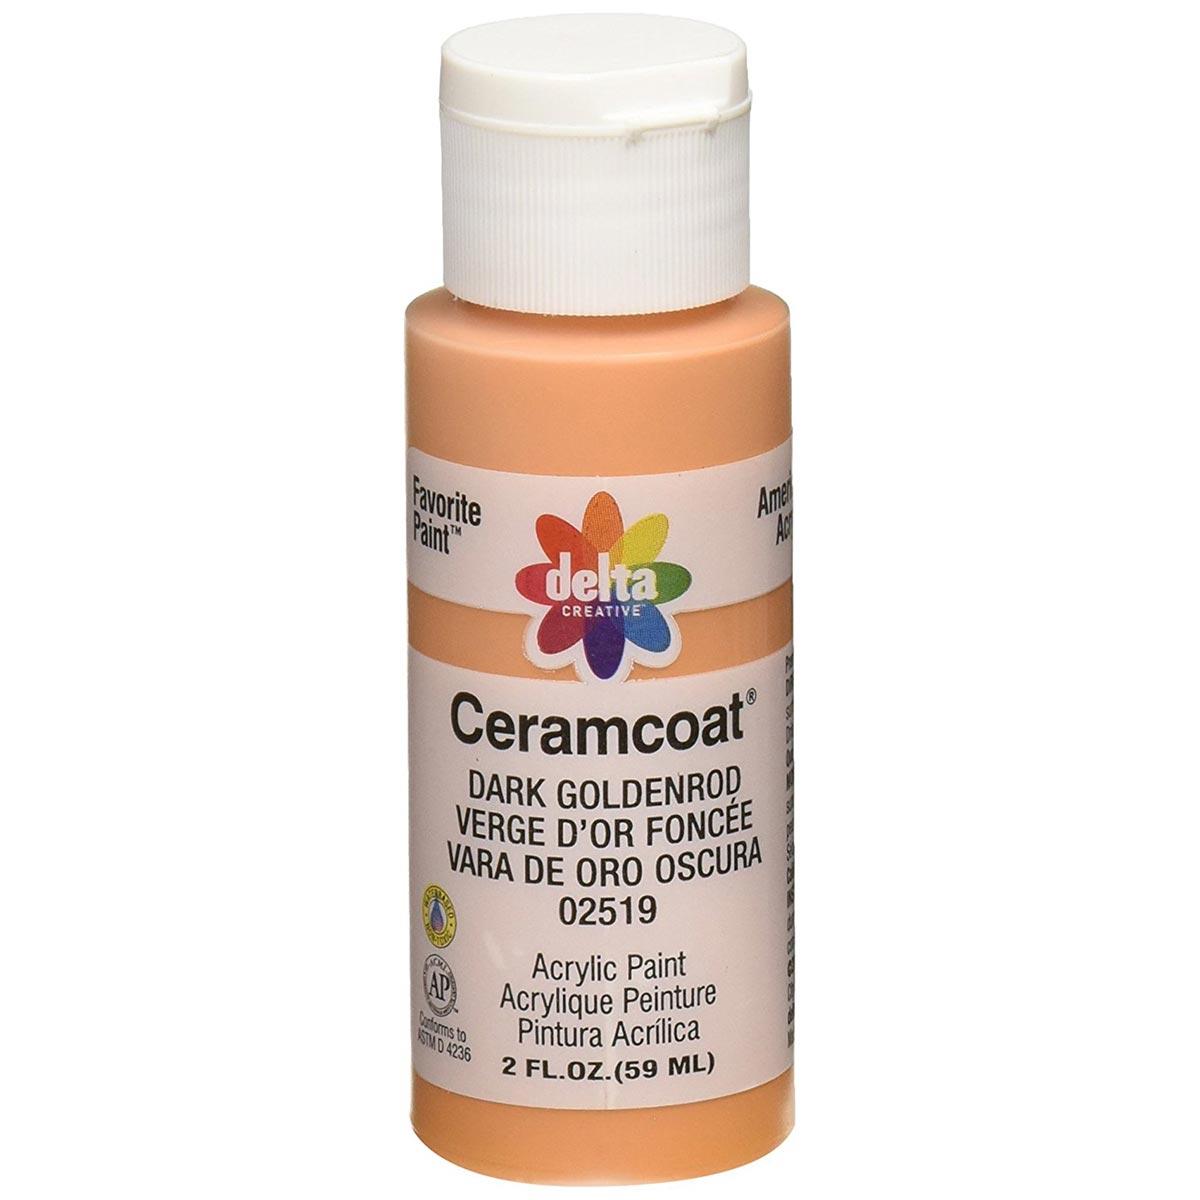 Delta Ceramcoat ® Acrylic Paint - Dark Goldenrod, 2 oz.